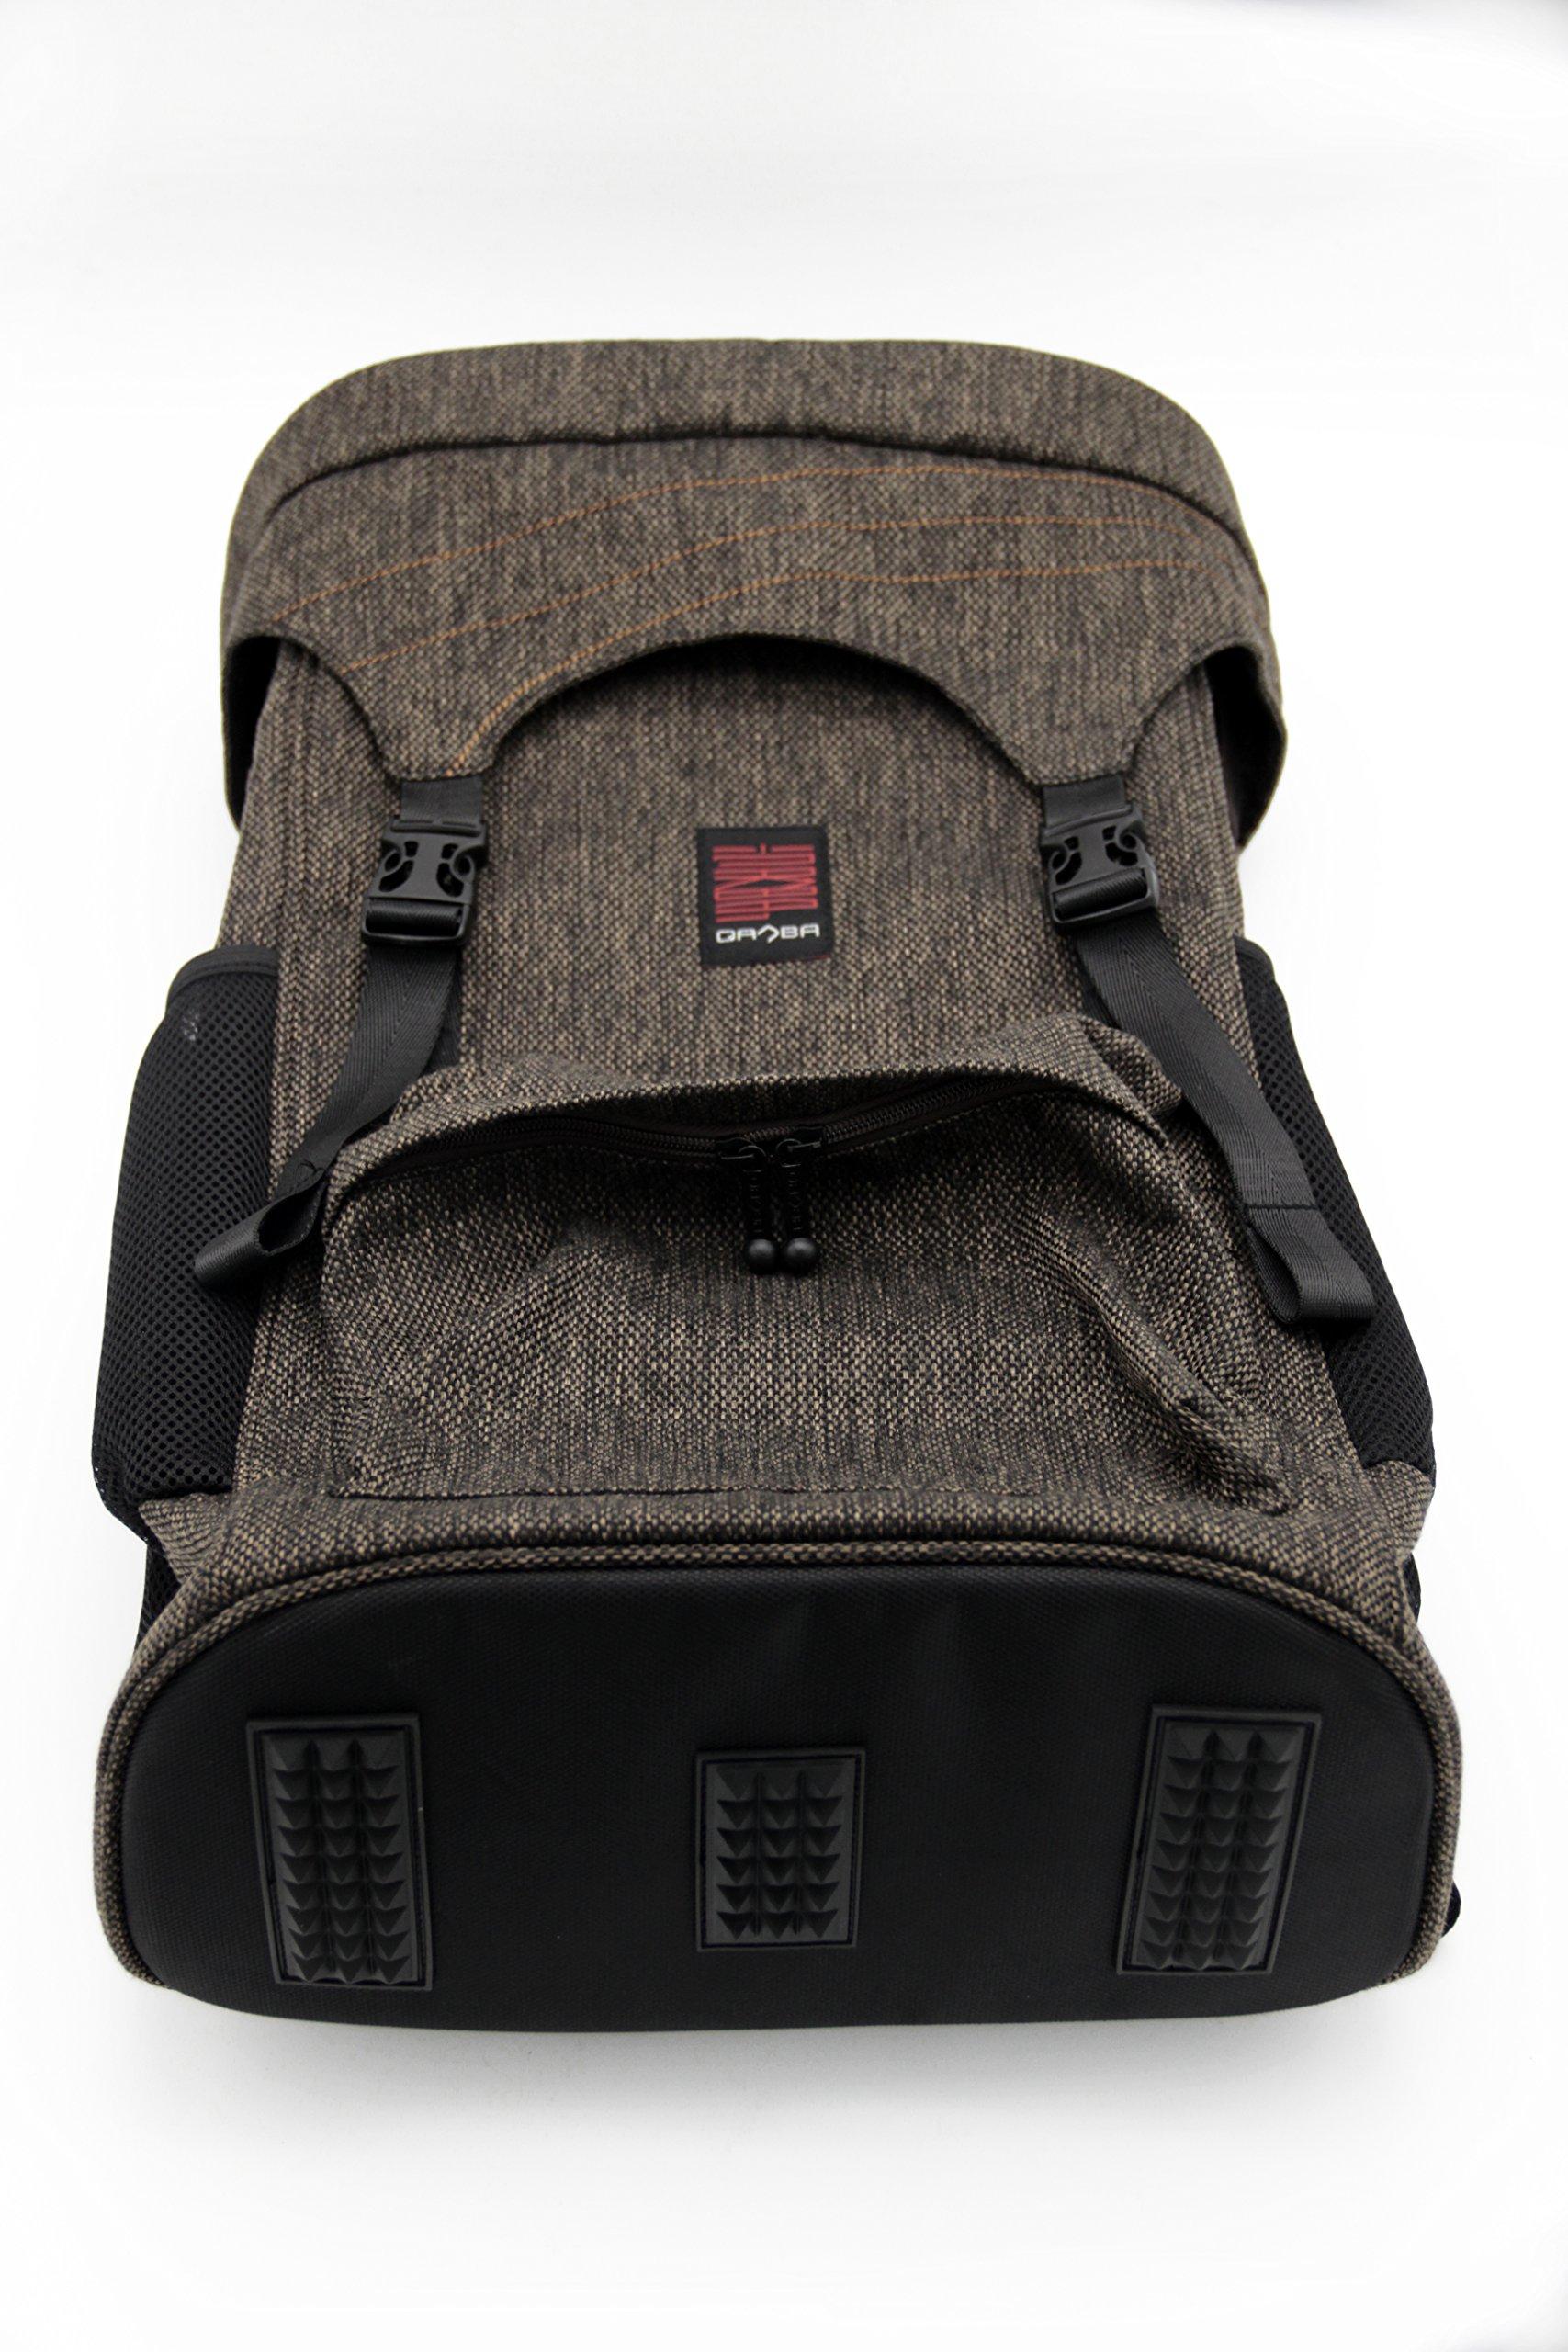 BAG-02 Guardian Backpack